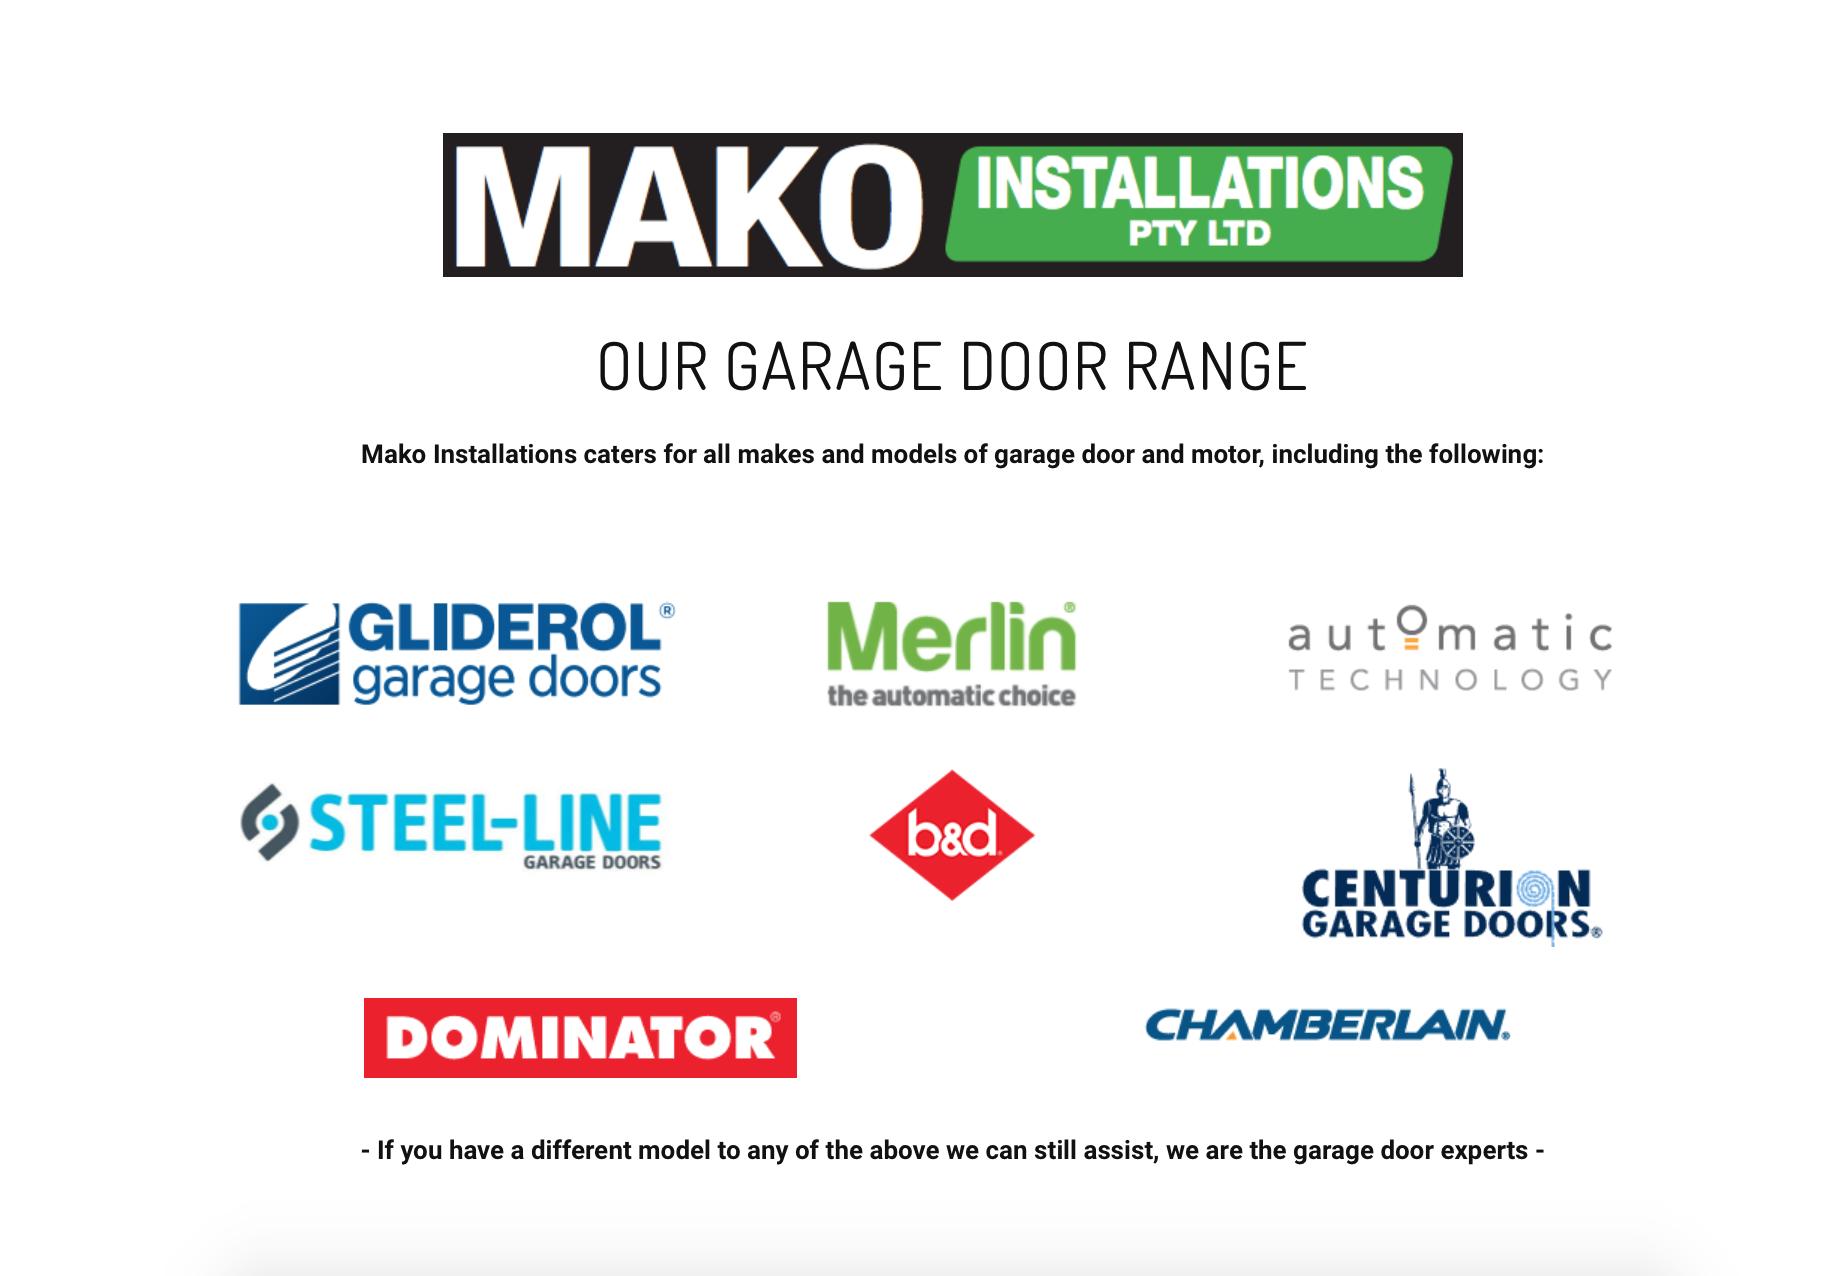 Mako-Installations-Garage-Doors-Tweed-Northern-Rivers-NSW-Gold-Coast-QLD-Byron-Lismore-door-models.png